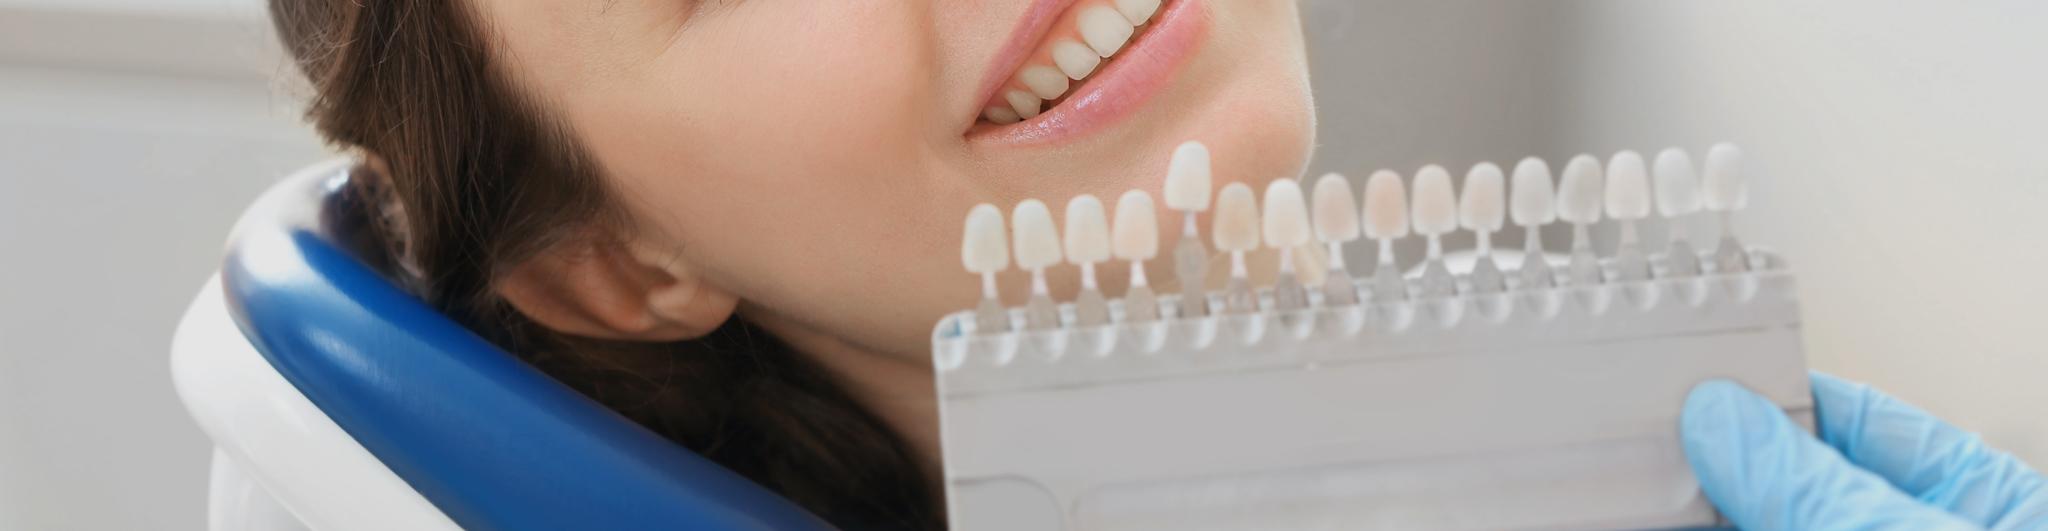 Brenchley Dental